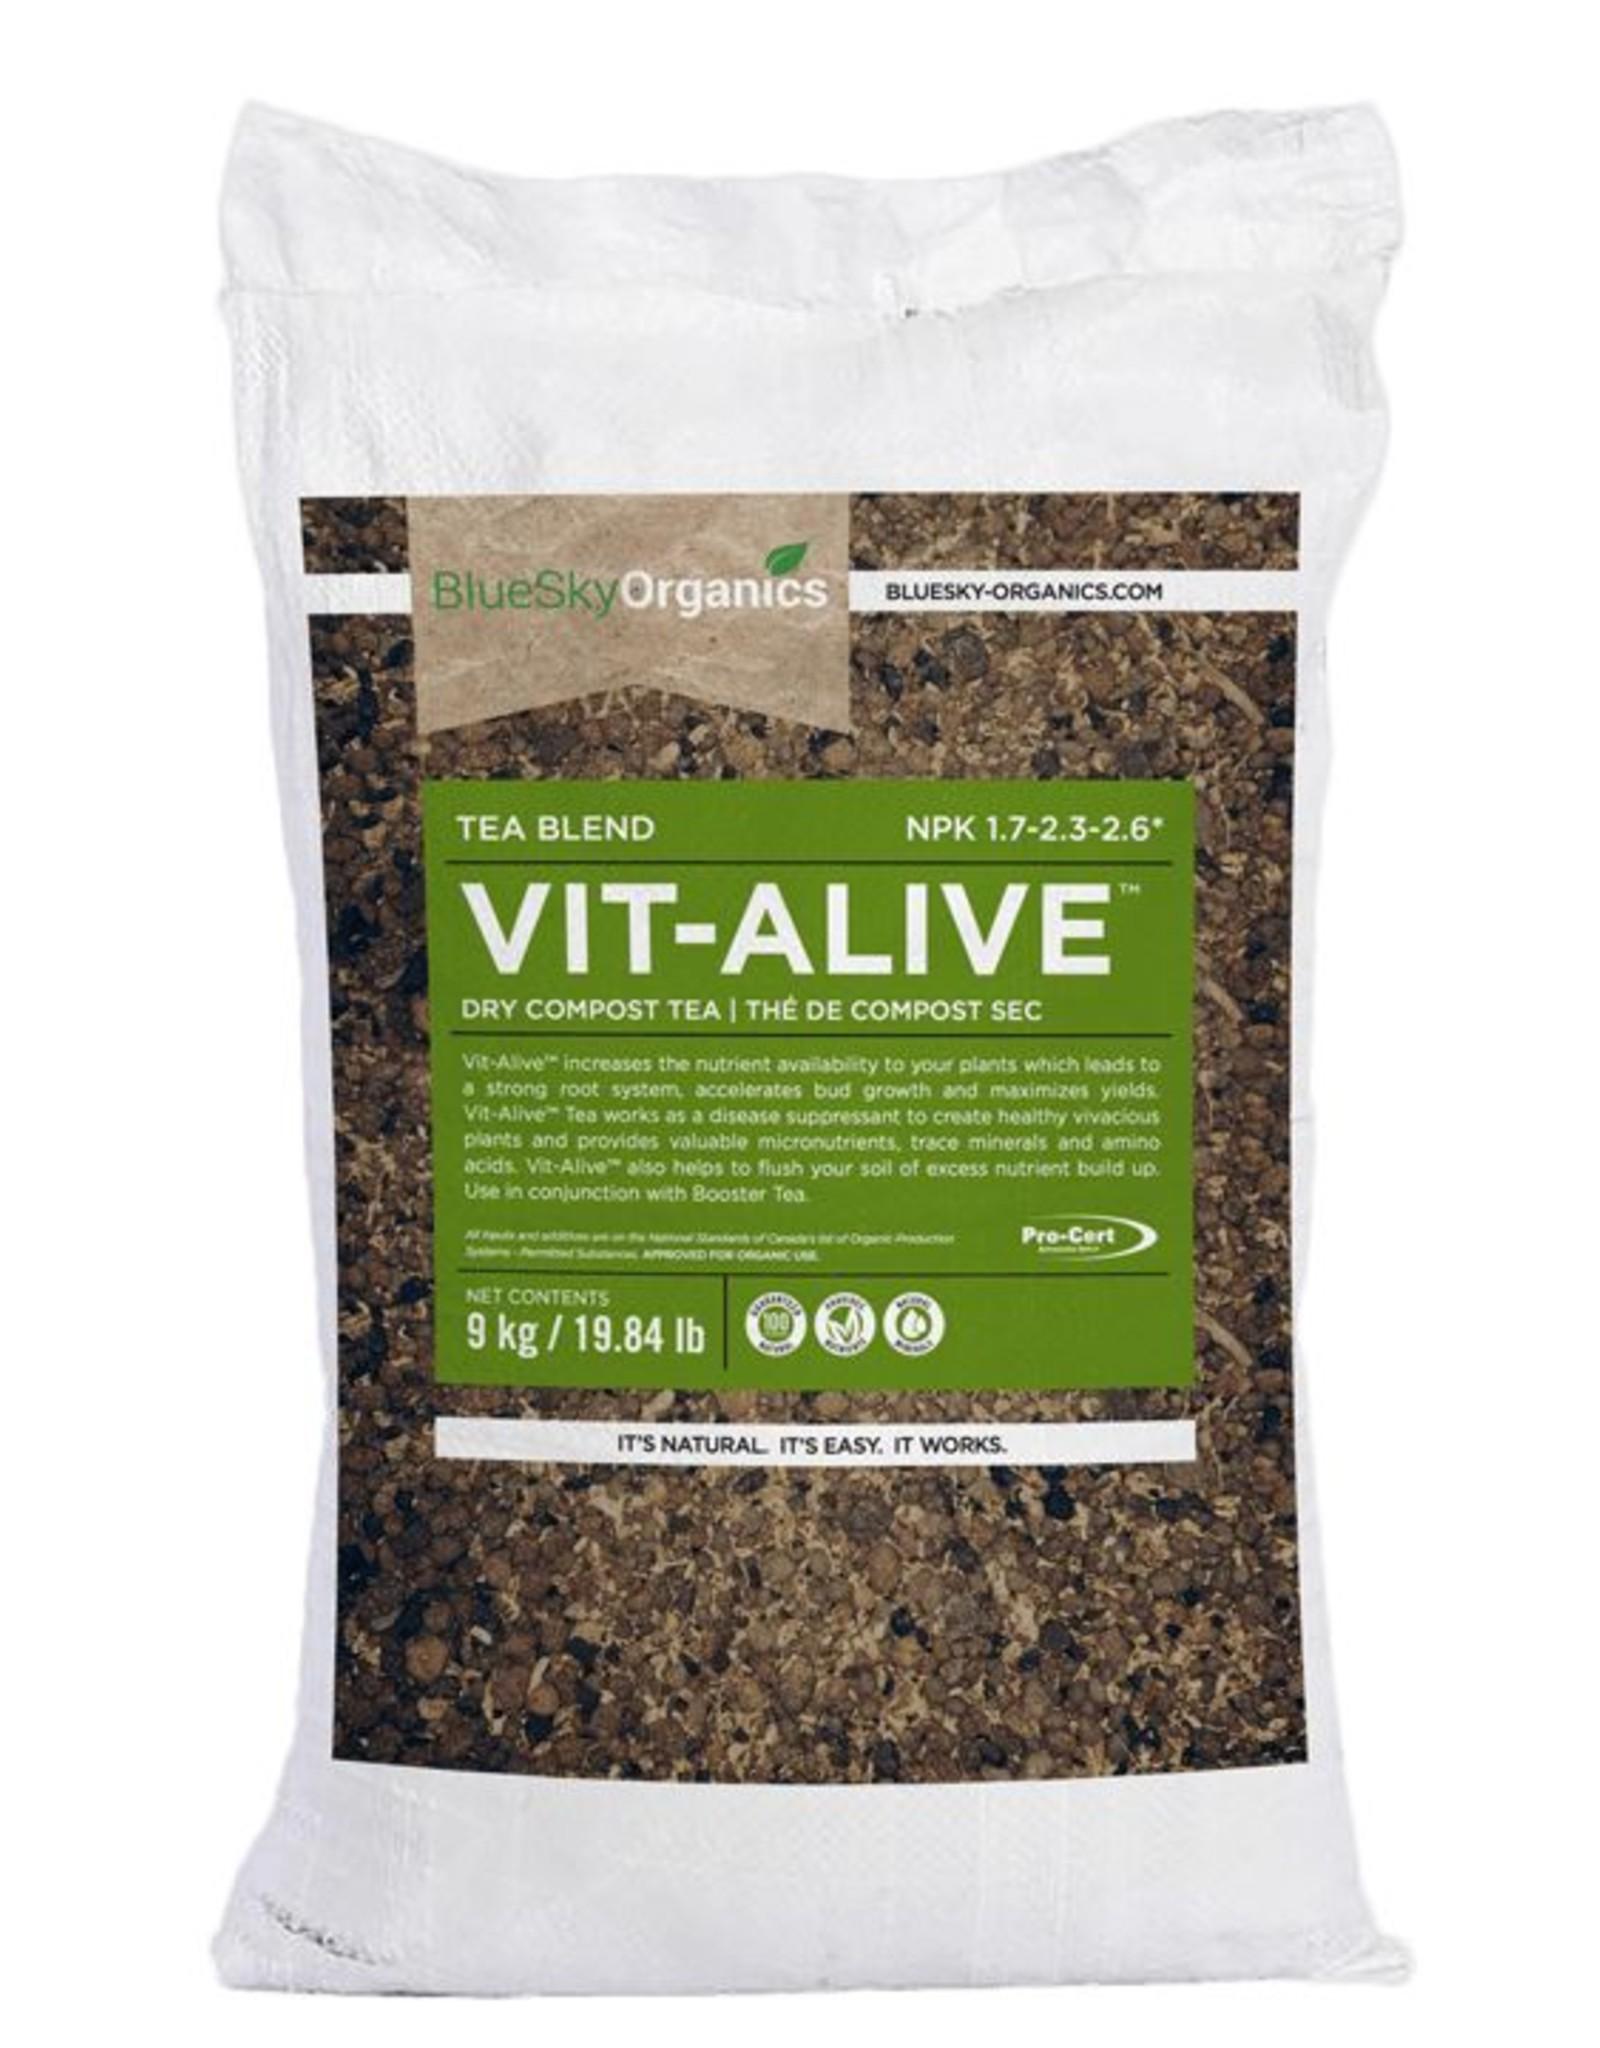 BlueSky Organics Vit-Alive 16Kg